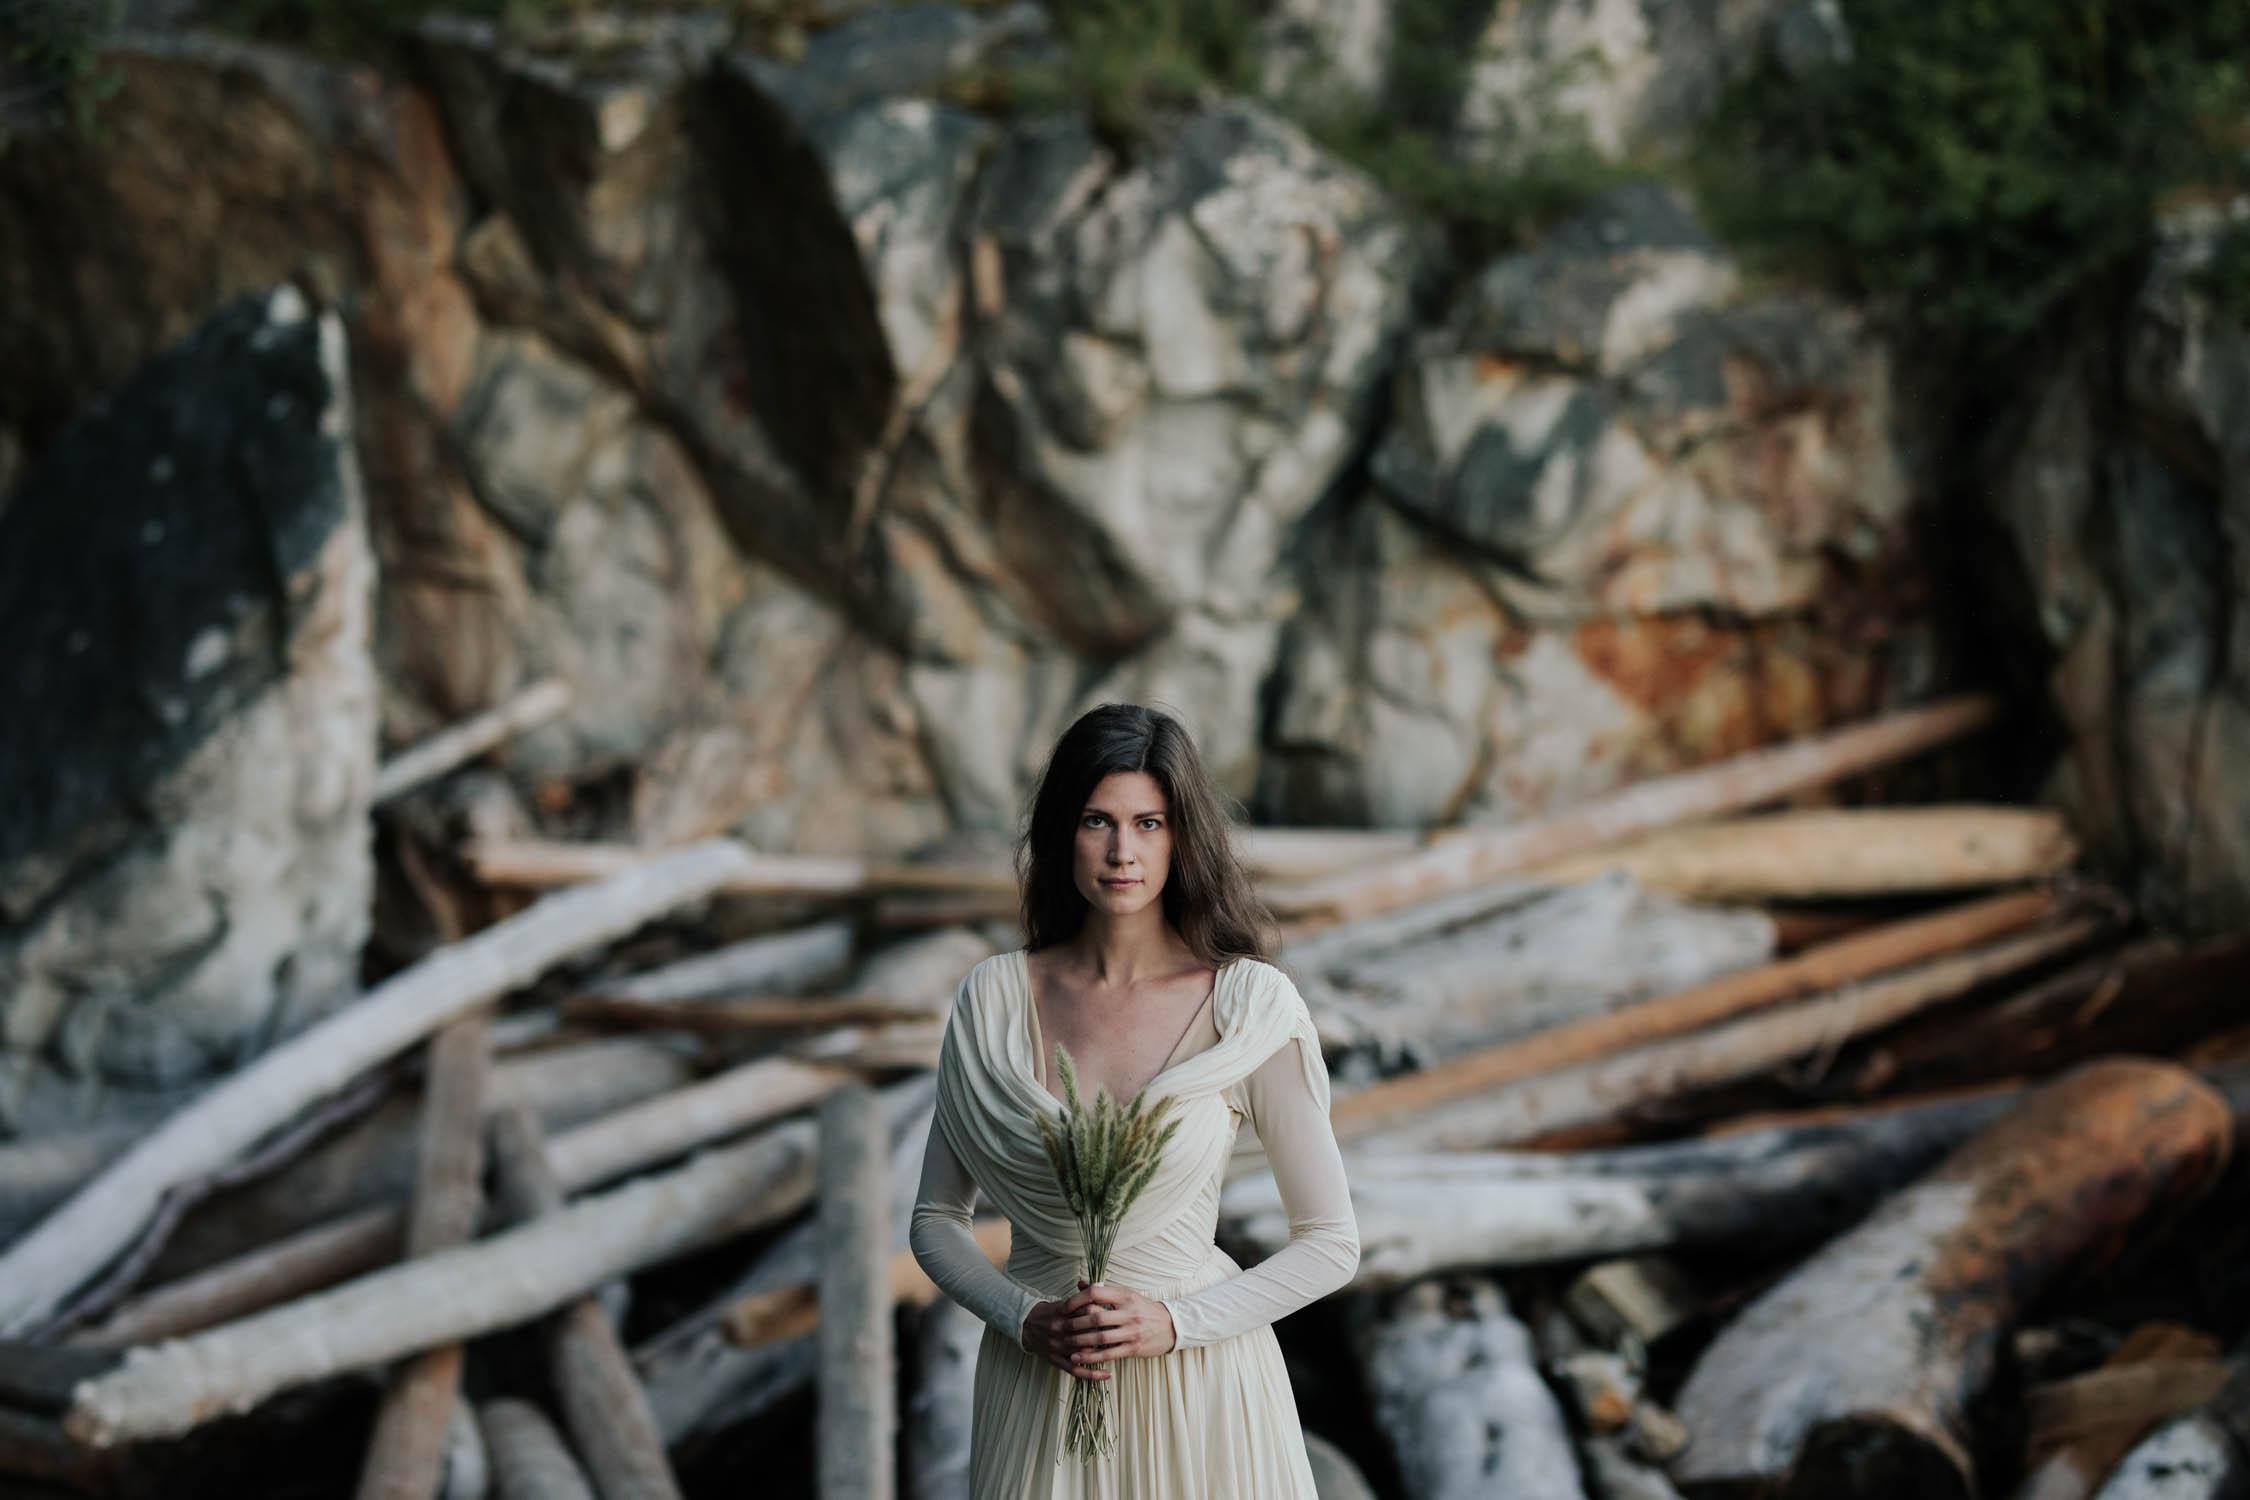 Bride Wearing Long Sleeved Silk Wedding Dress Holds Unusual Natural Grass Bouquet